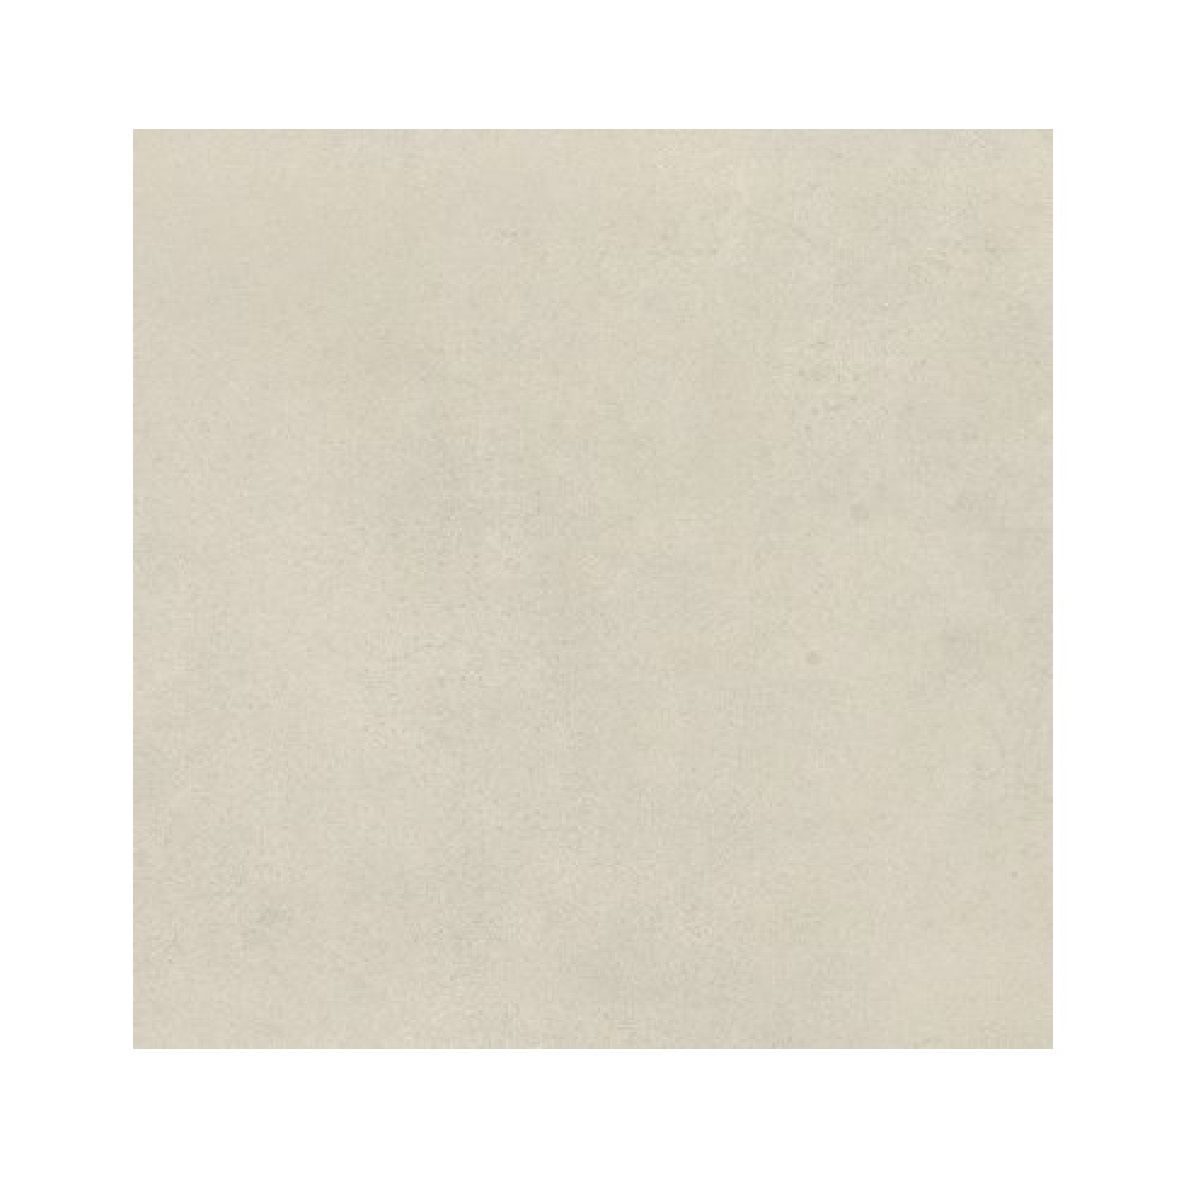 RAK Surface Off White Rustic Tile 600 x 600mm